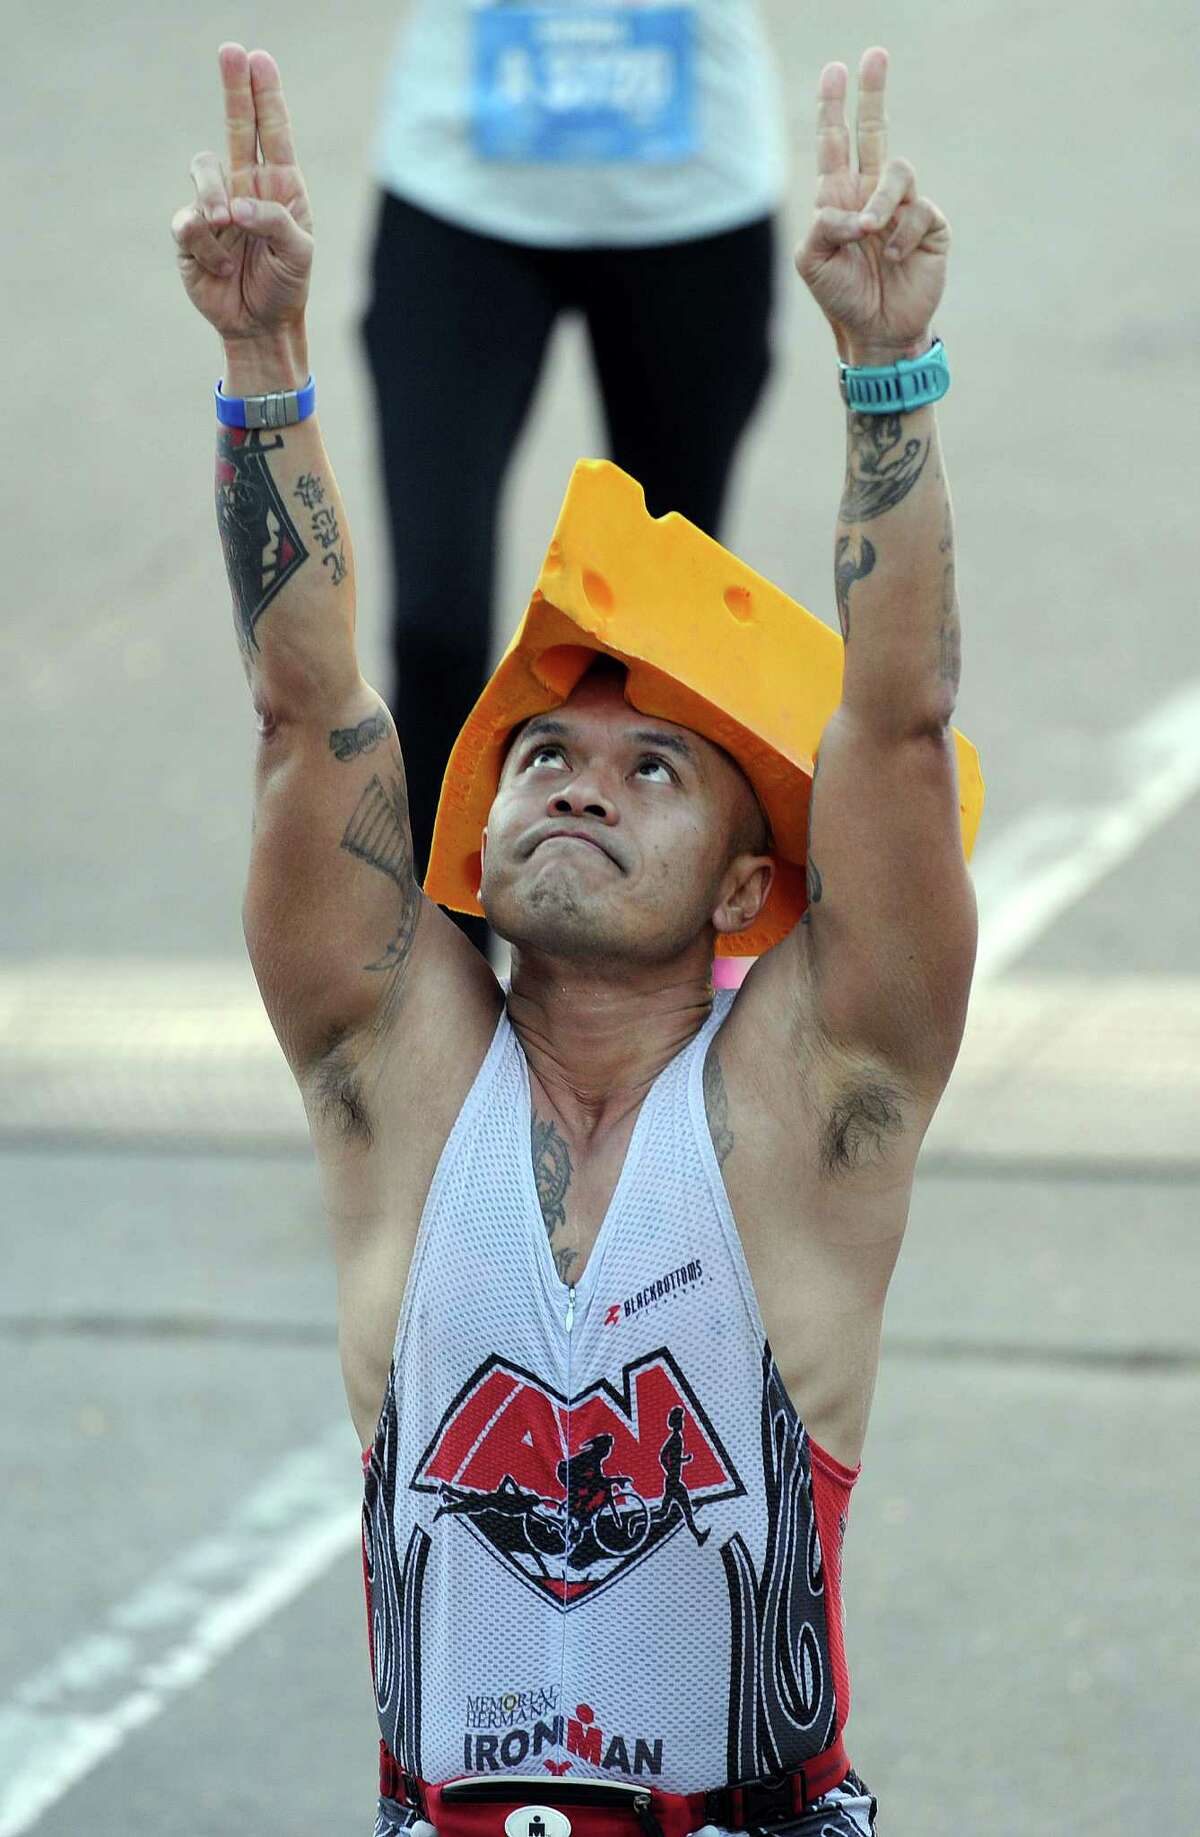 Marathoner Quoc Duong celebrates after crossing the finish line during the Houston Marathon, Sunday, January 18, 2015 in Houston.